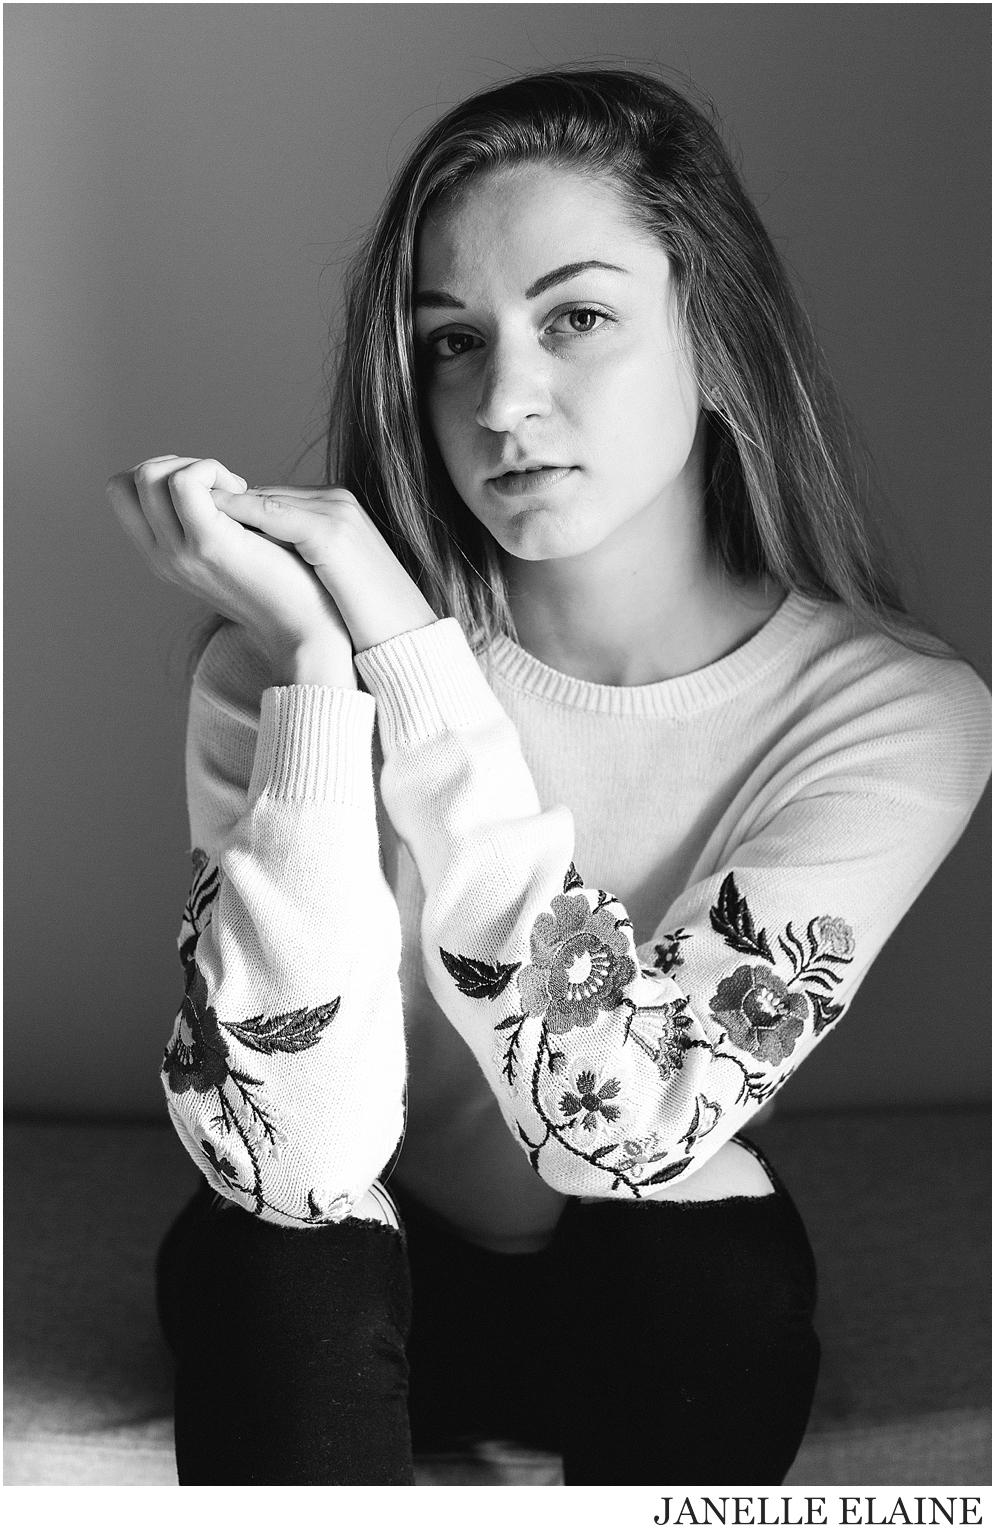 kirsi-seattle-wa-portrait photography-janelle elaine photography-57.jpg